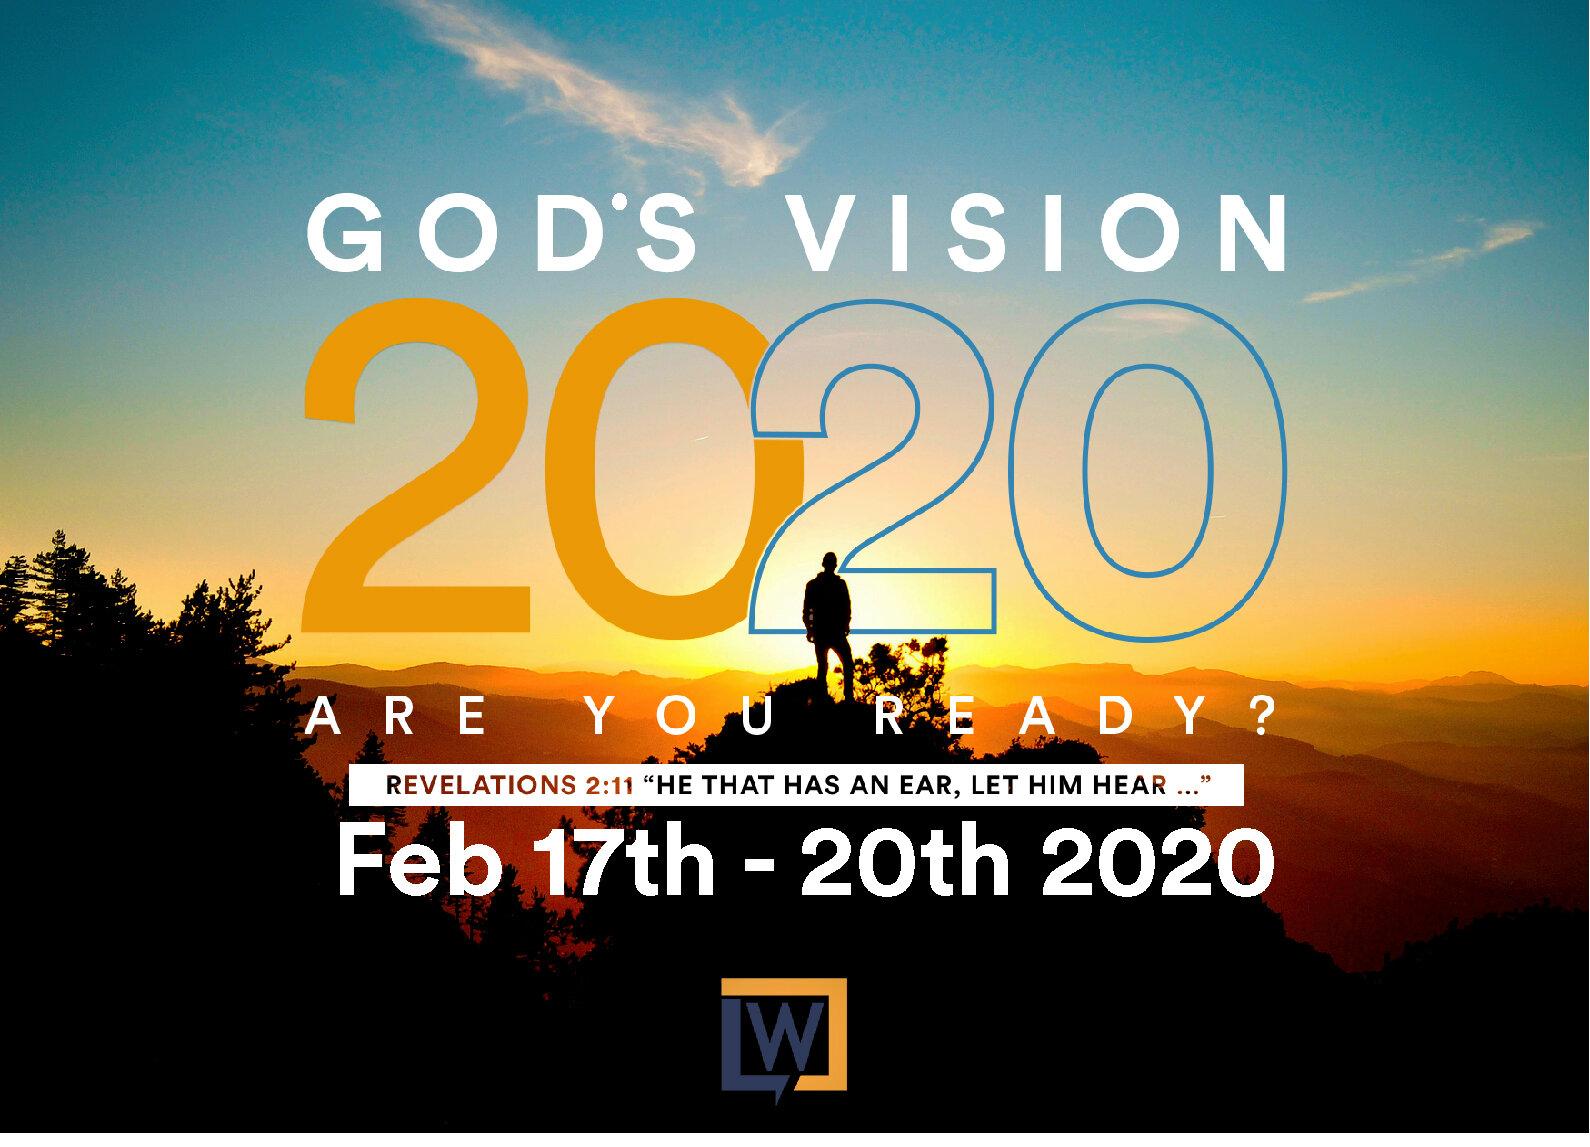 Living Word Christmas Show 2020 Gods Vision 2020 — Living Word Christian Center